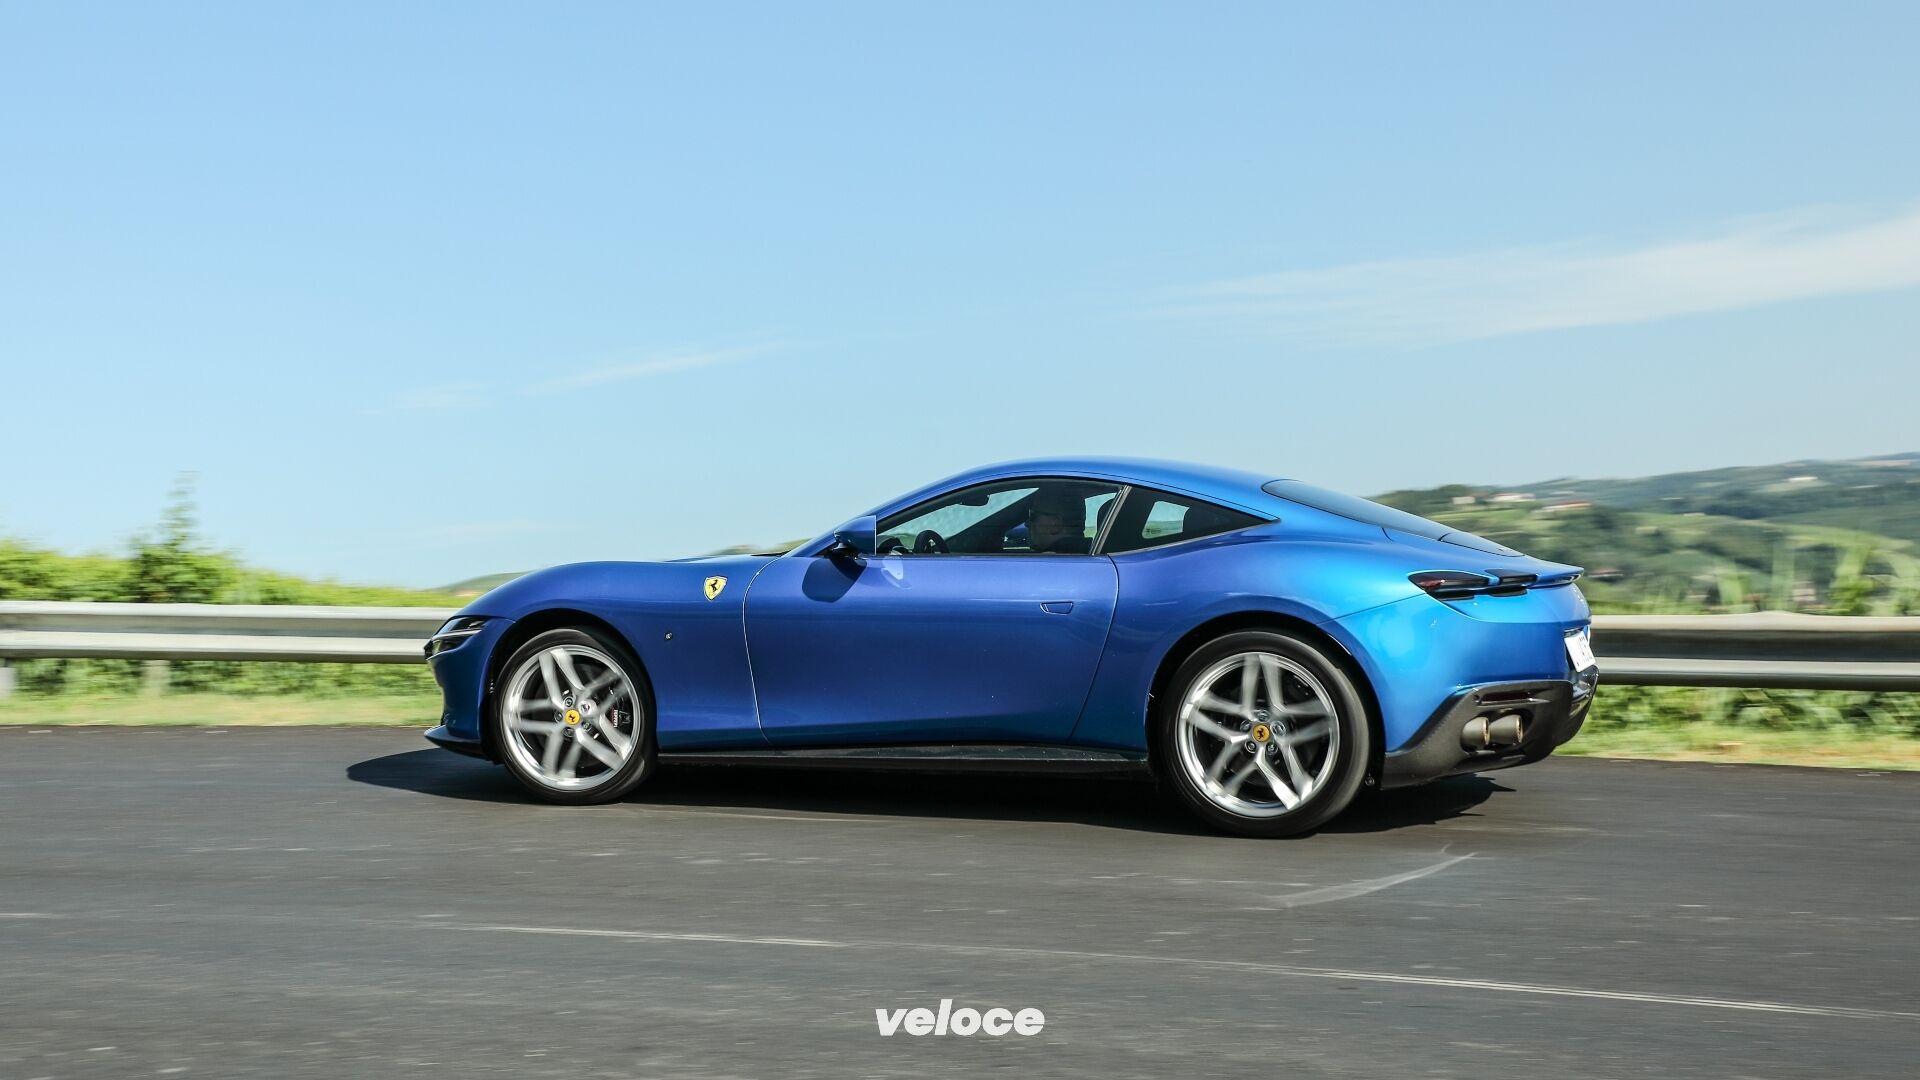 Ferrari-Roma-Blu-Corsa-11-1920x1080.jpg